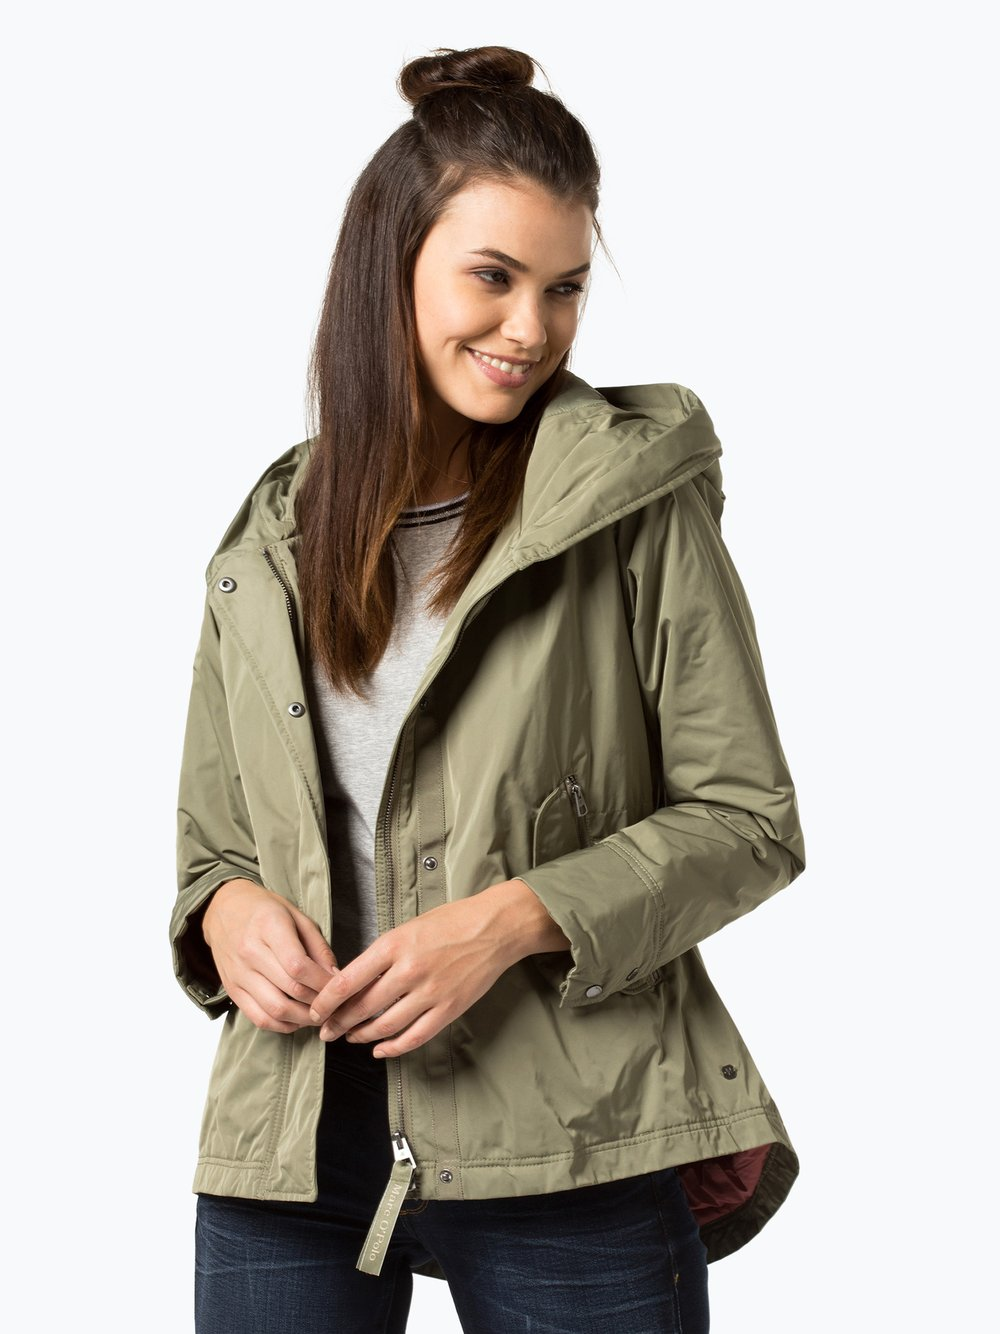 Marc O'Polo Damen Jacke online kaufen | VANGRAAF.COM